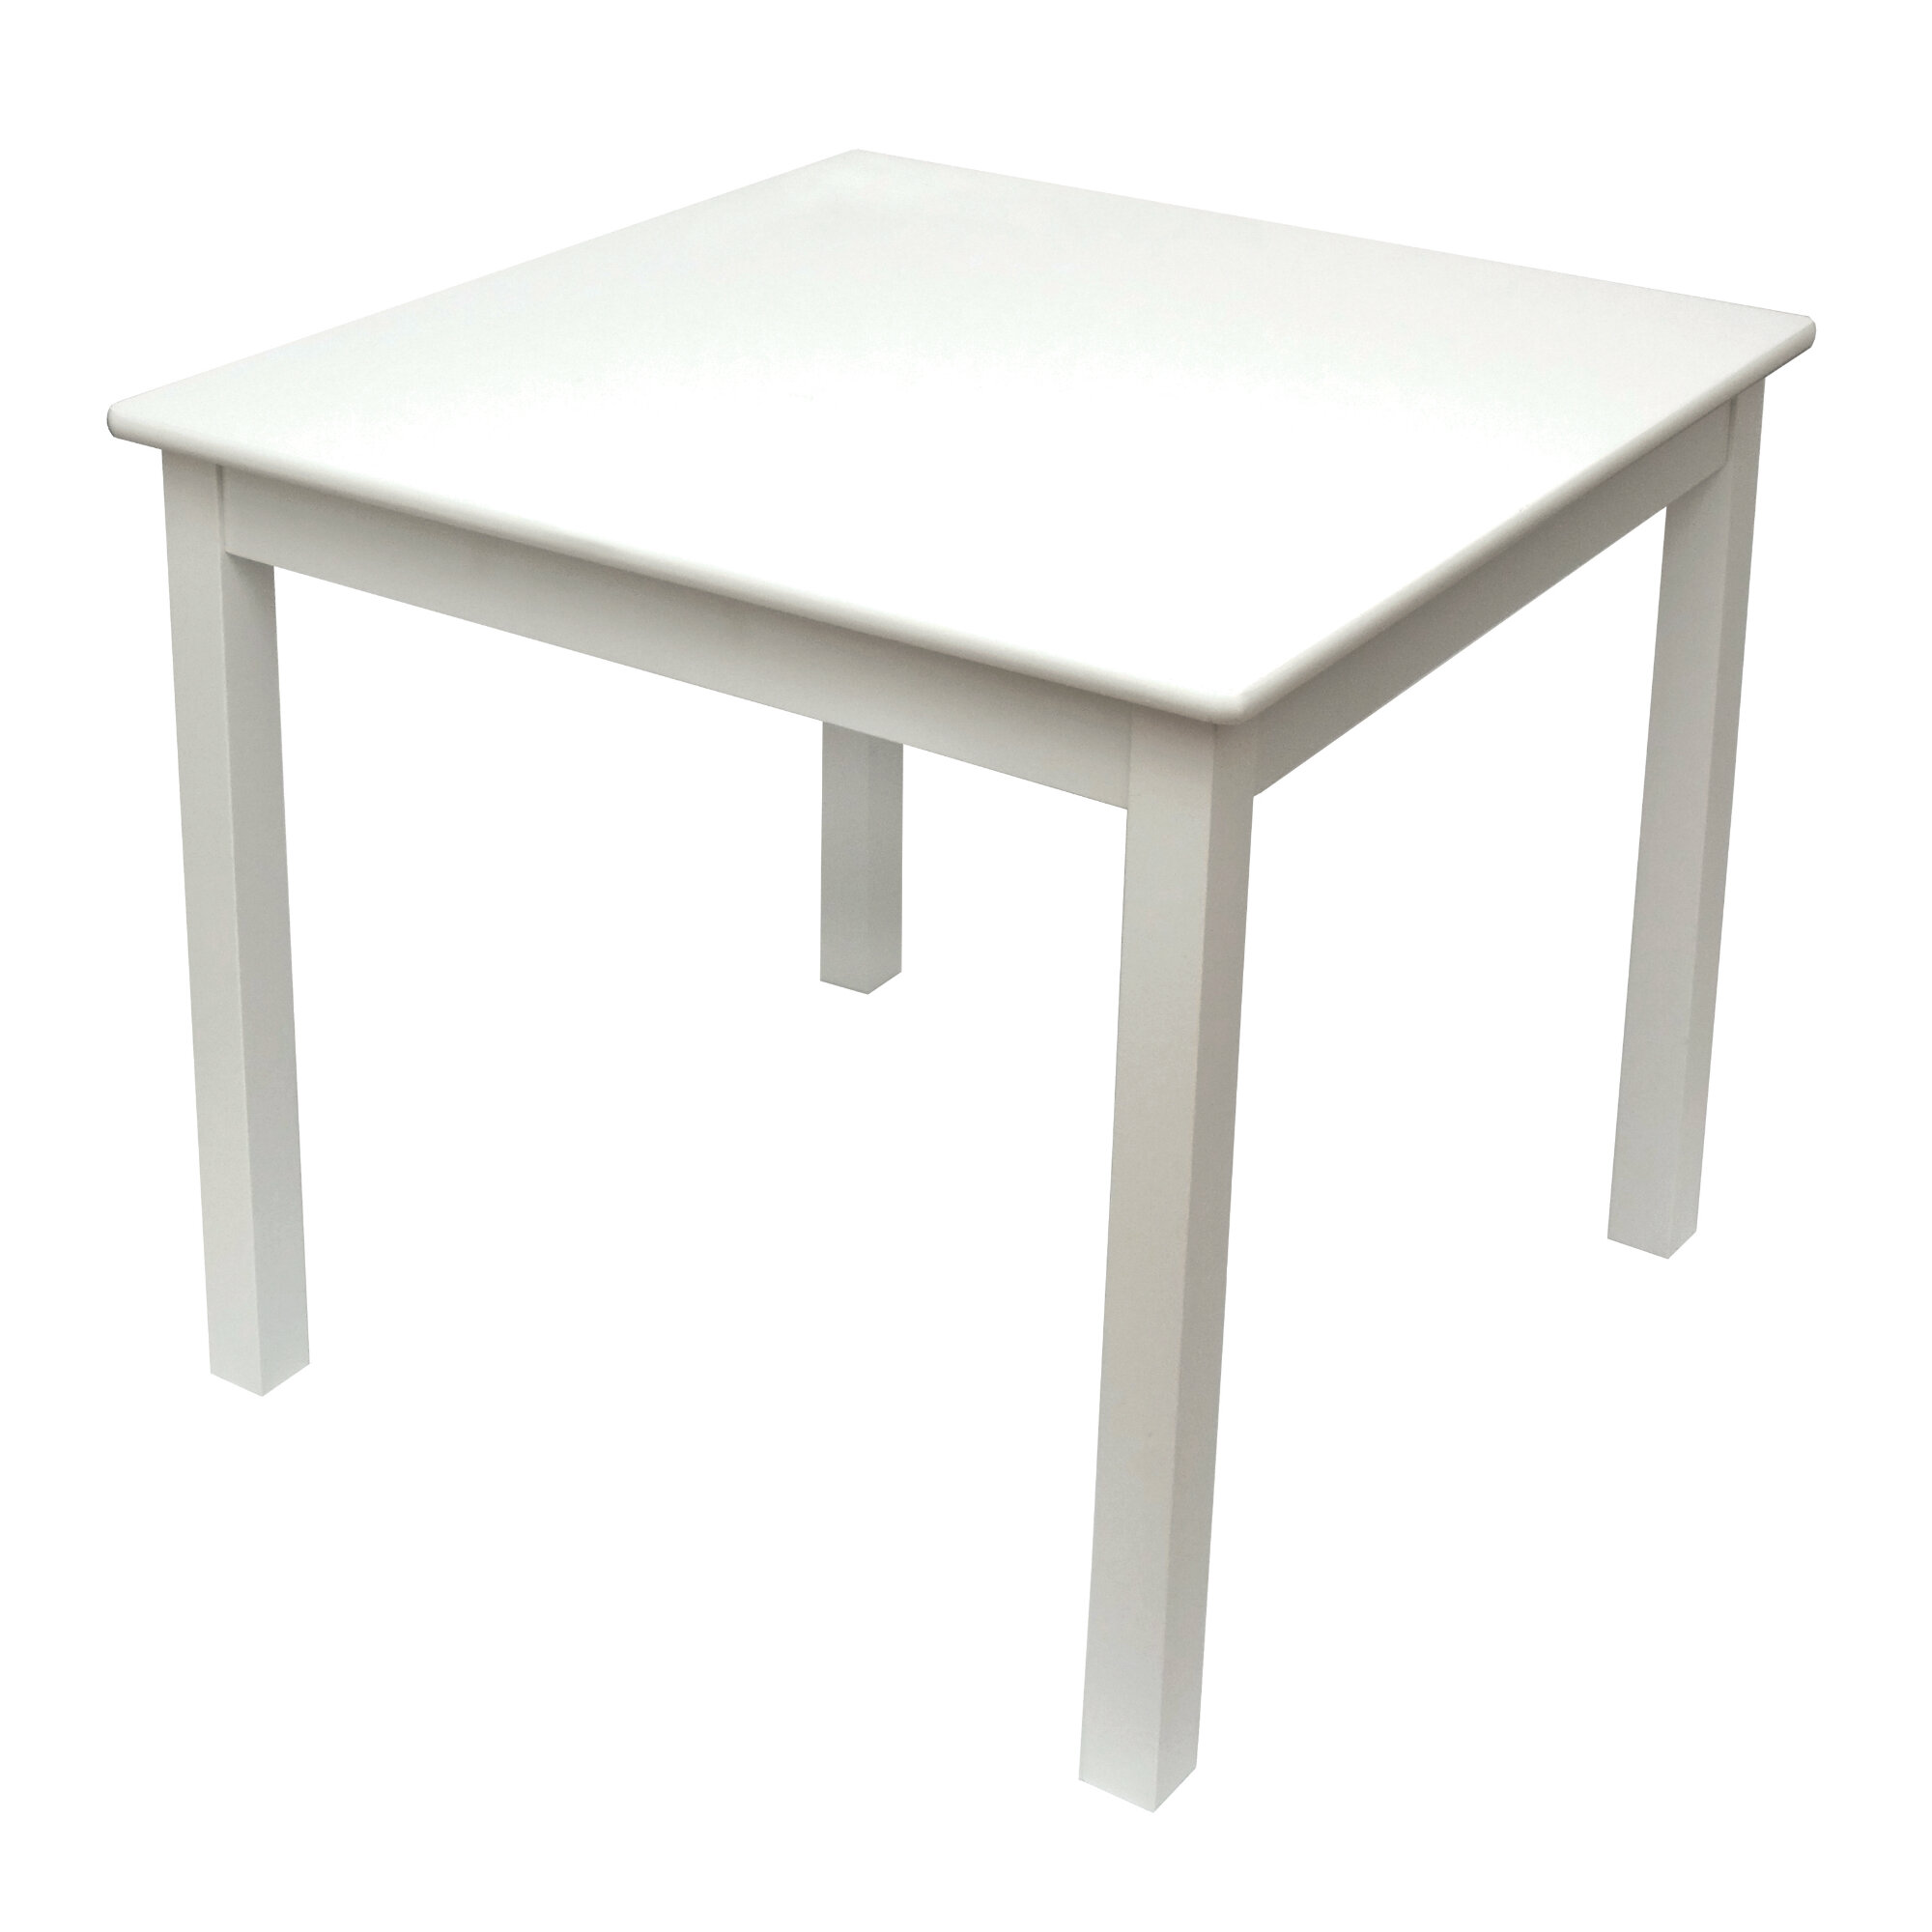 Lipper International XO Kids Square Writing Table U0026 Reviews | Wayfair